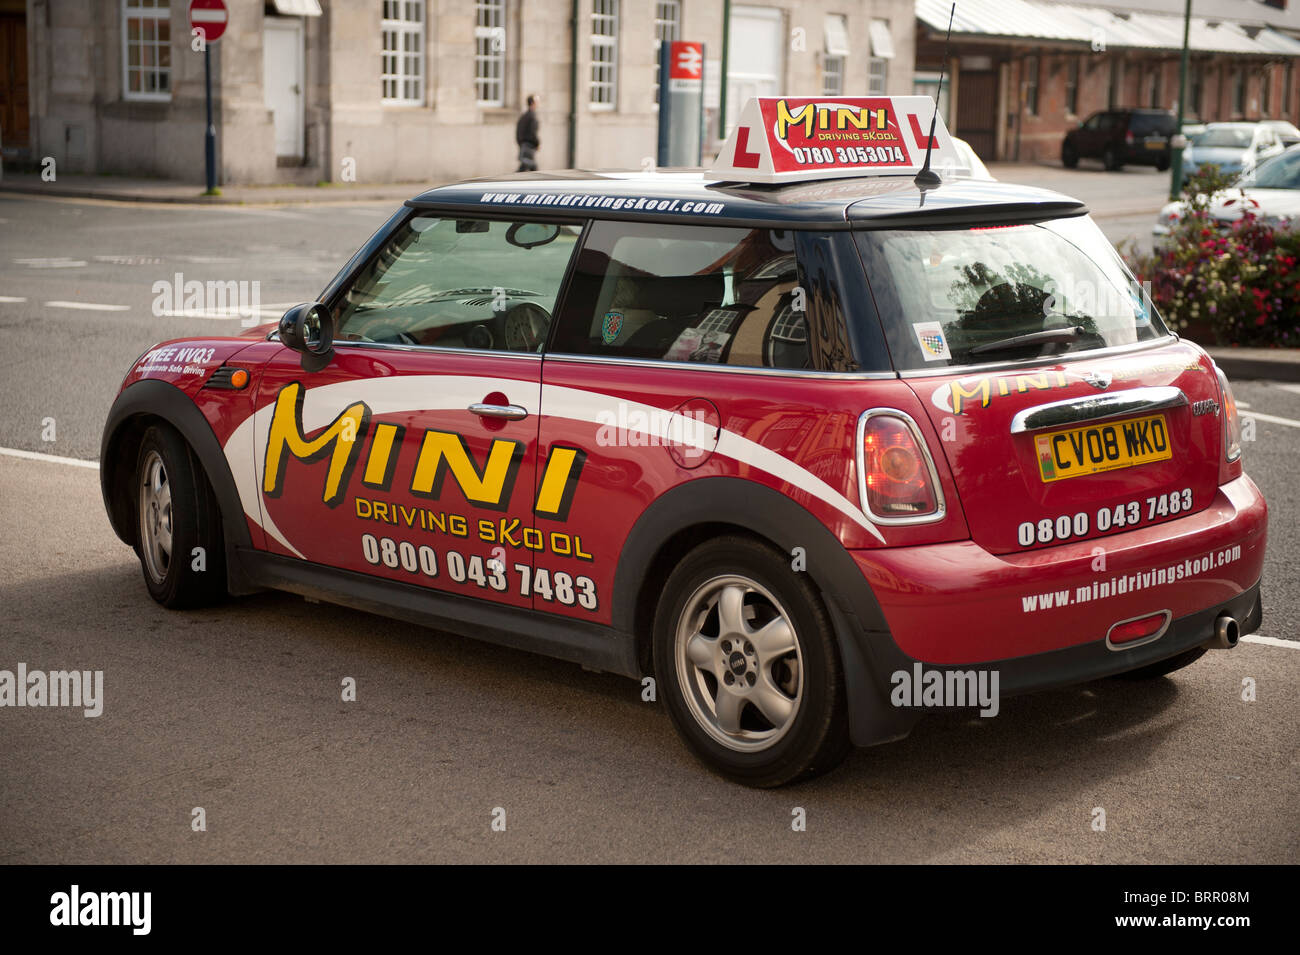 Mini coche autoescuela lección UK Imagen De Stock